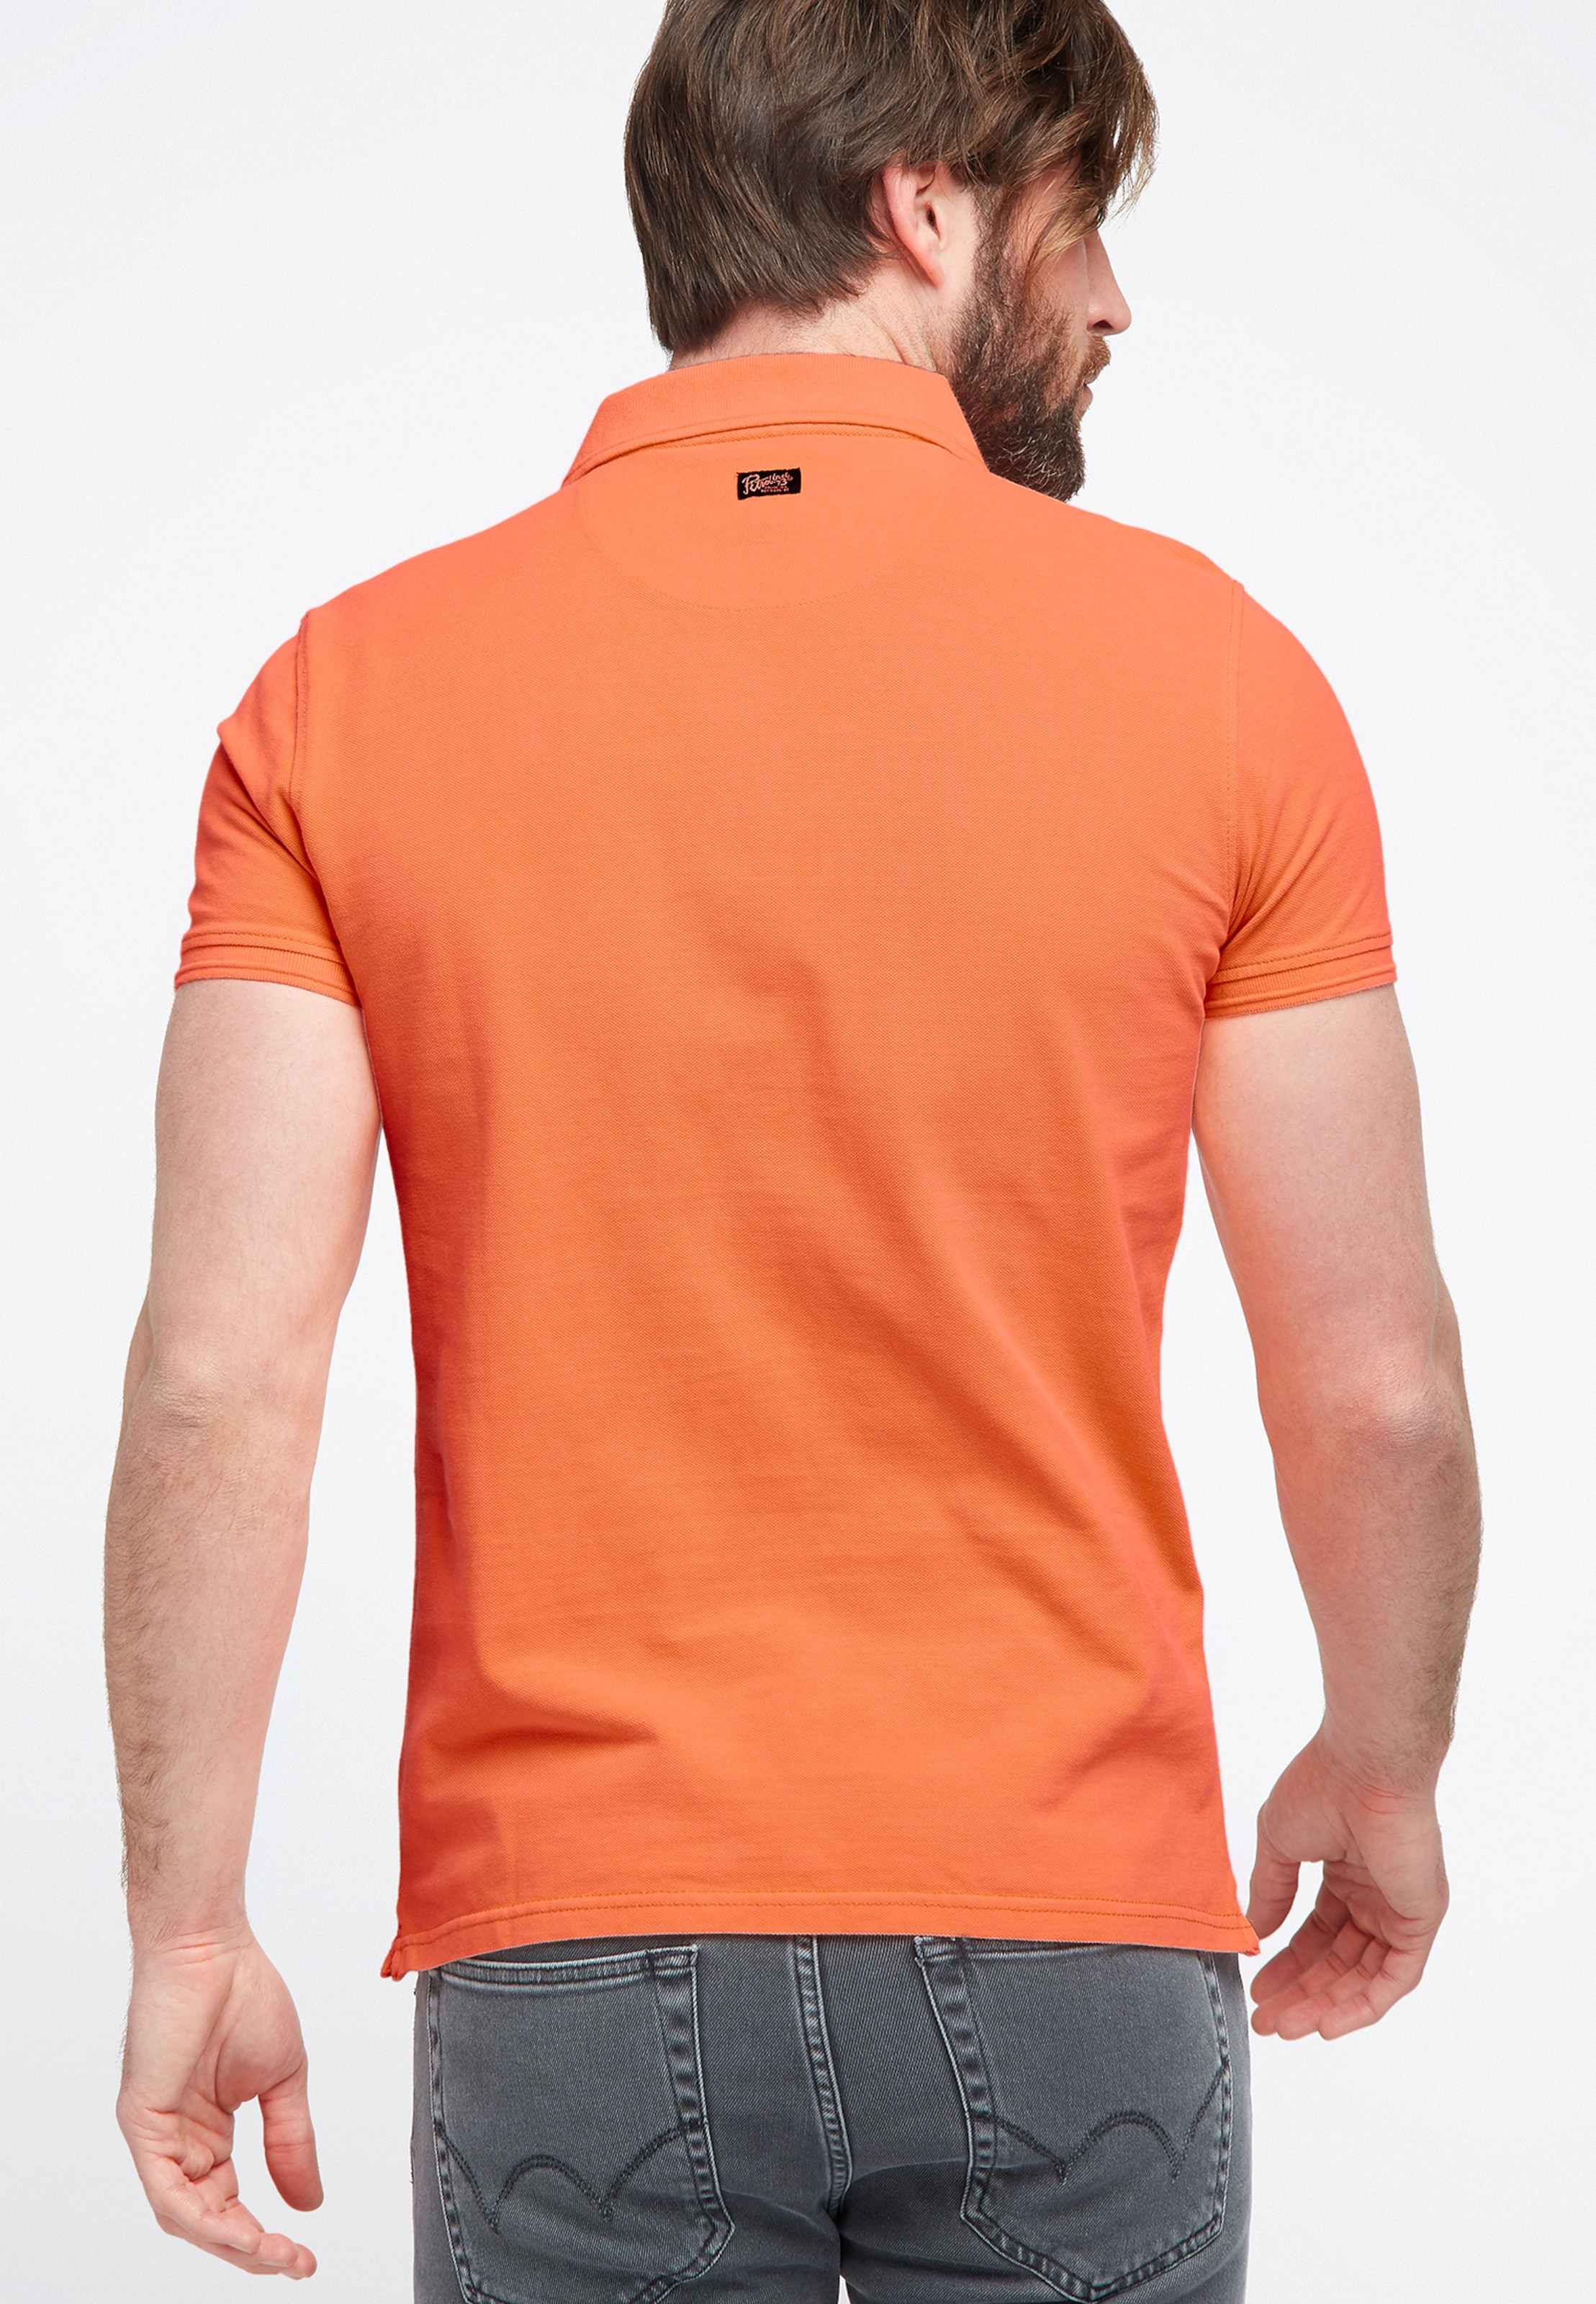 Petrol In Petrol Petrol Industries Industries Lichtoranje In Industries In Lichtoranje Shirt Shirt Shirt rWCoxBde